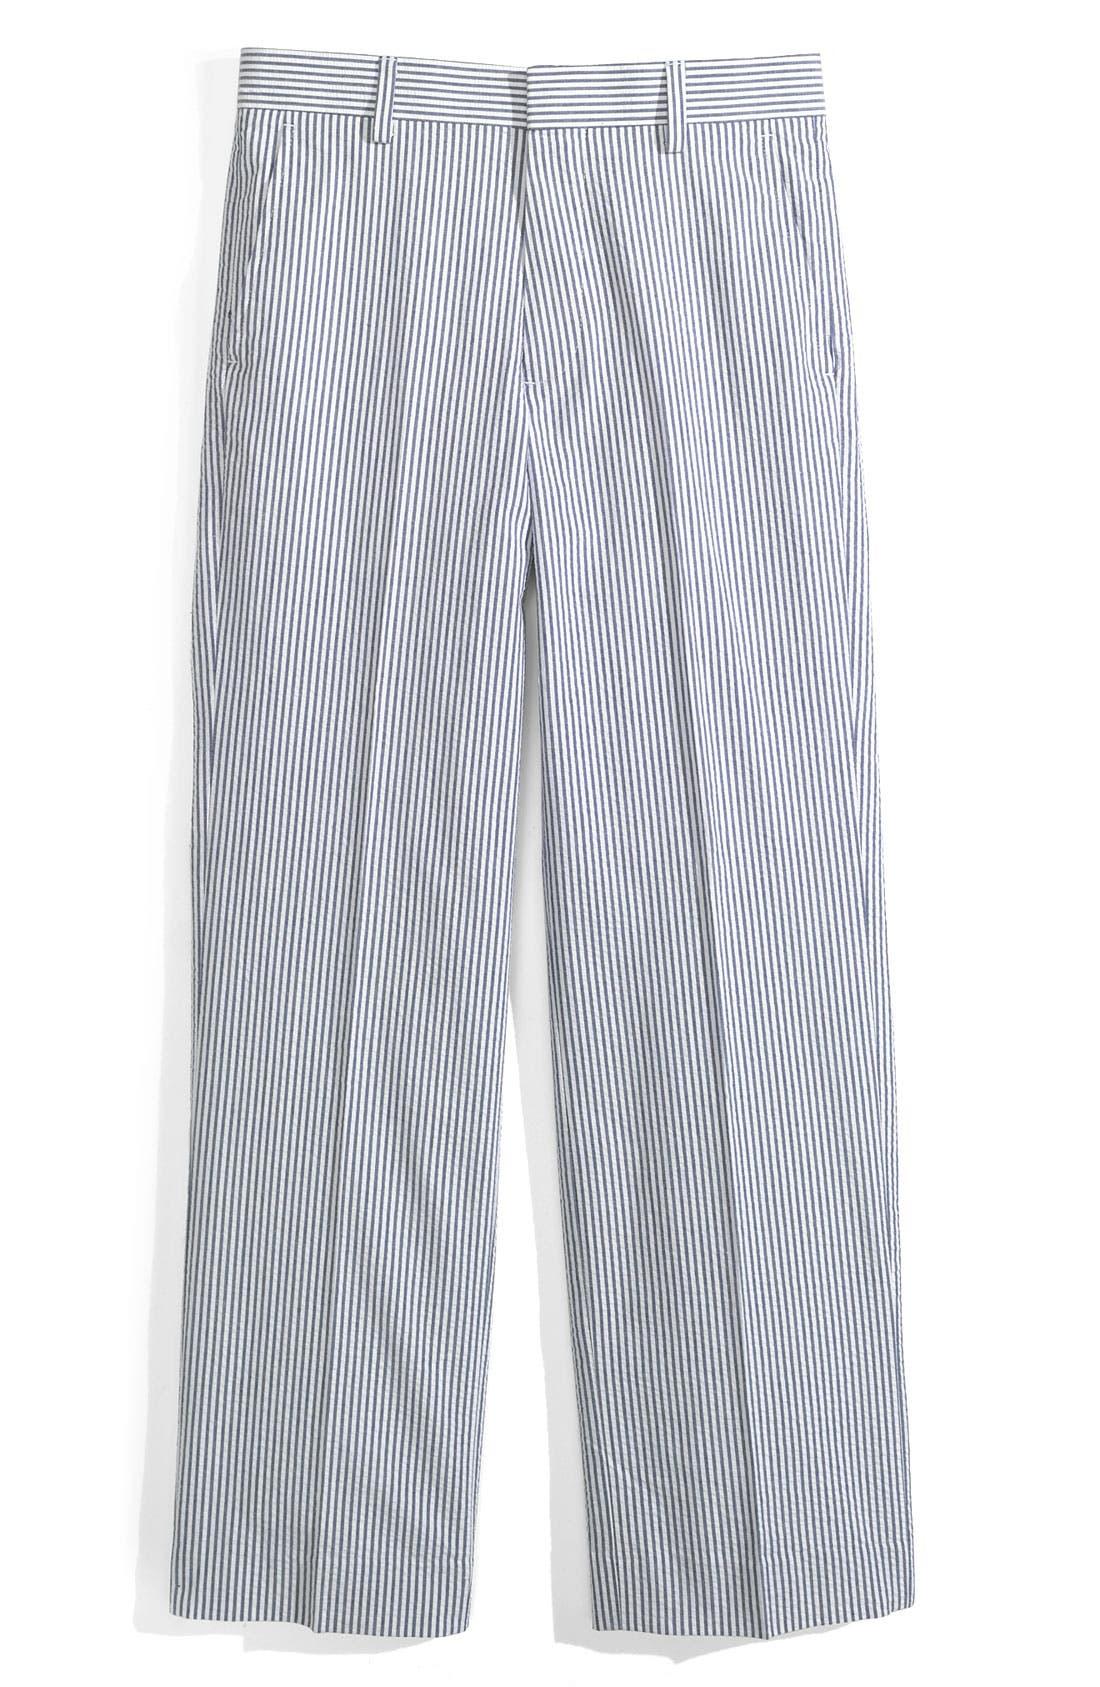 Alternate Image 1 Selected - Nordstrom 'Phillip' Seersucker Trousers (Big Boys)